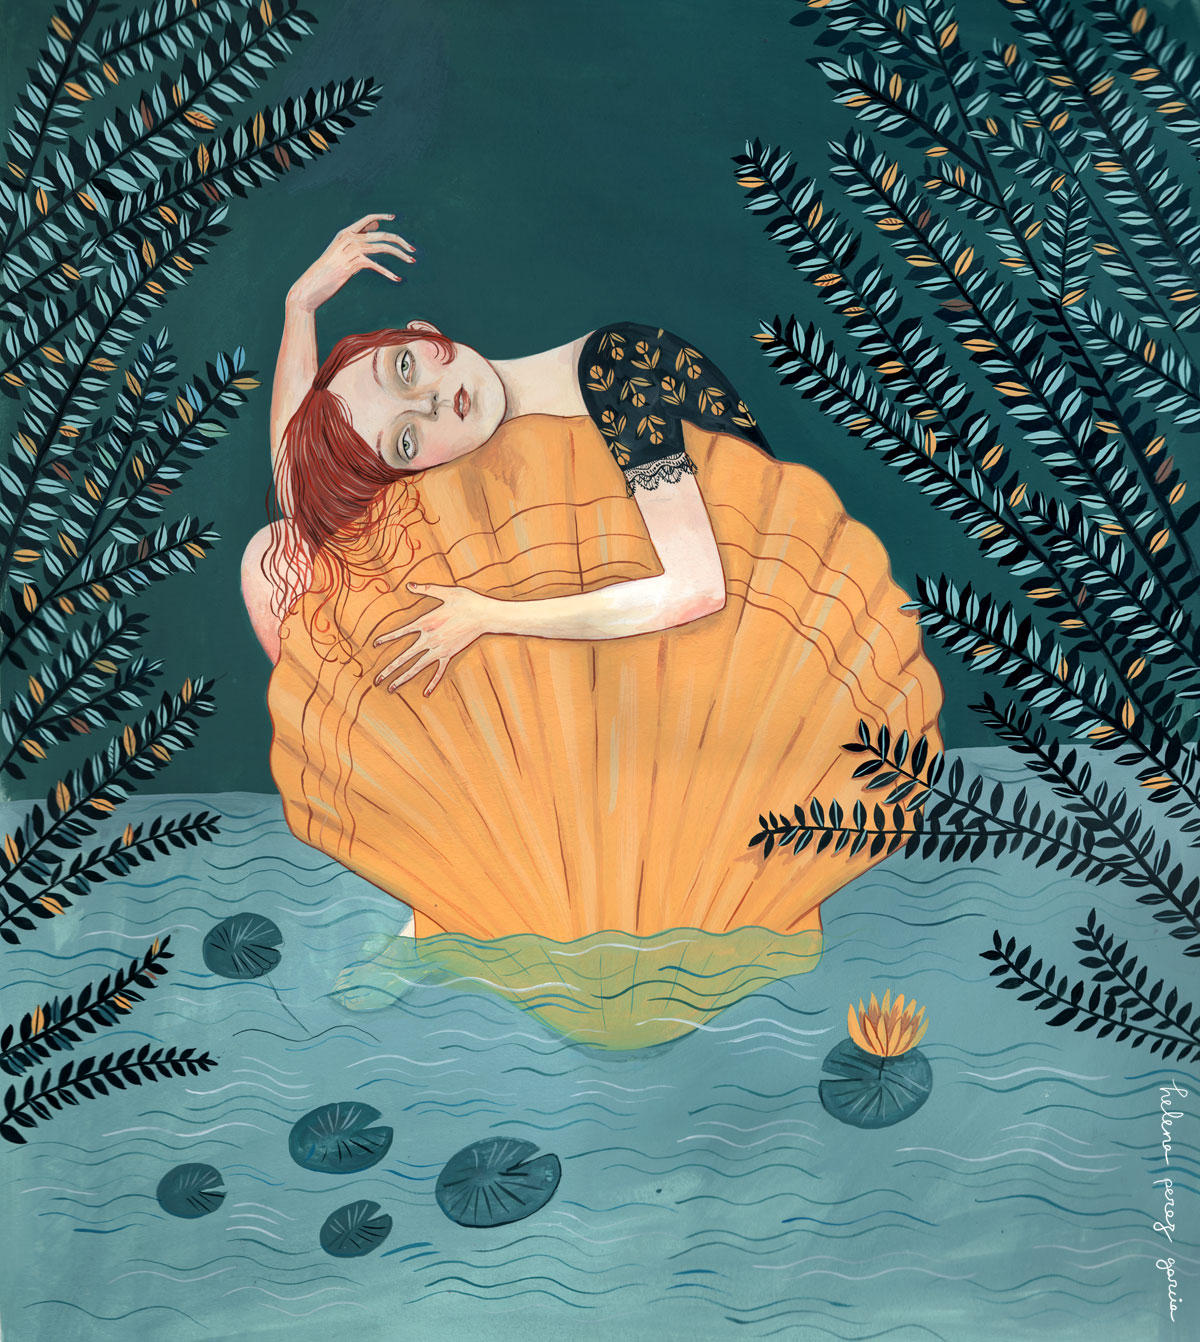 helena-perez-garcia-illustration-3-2